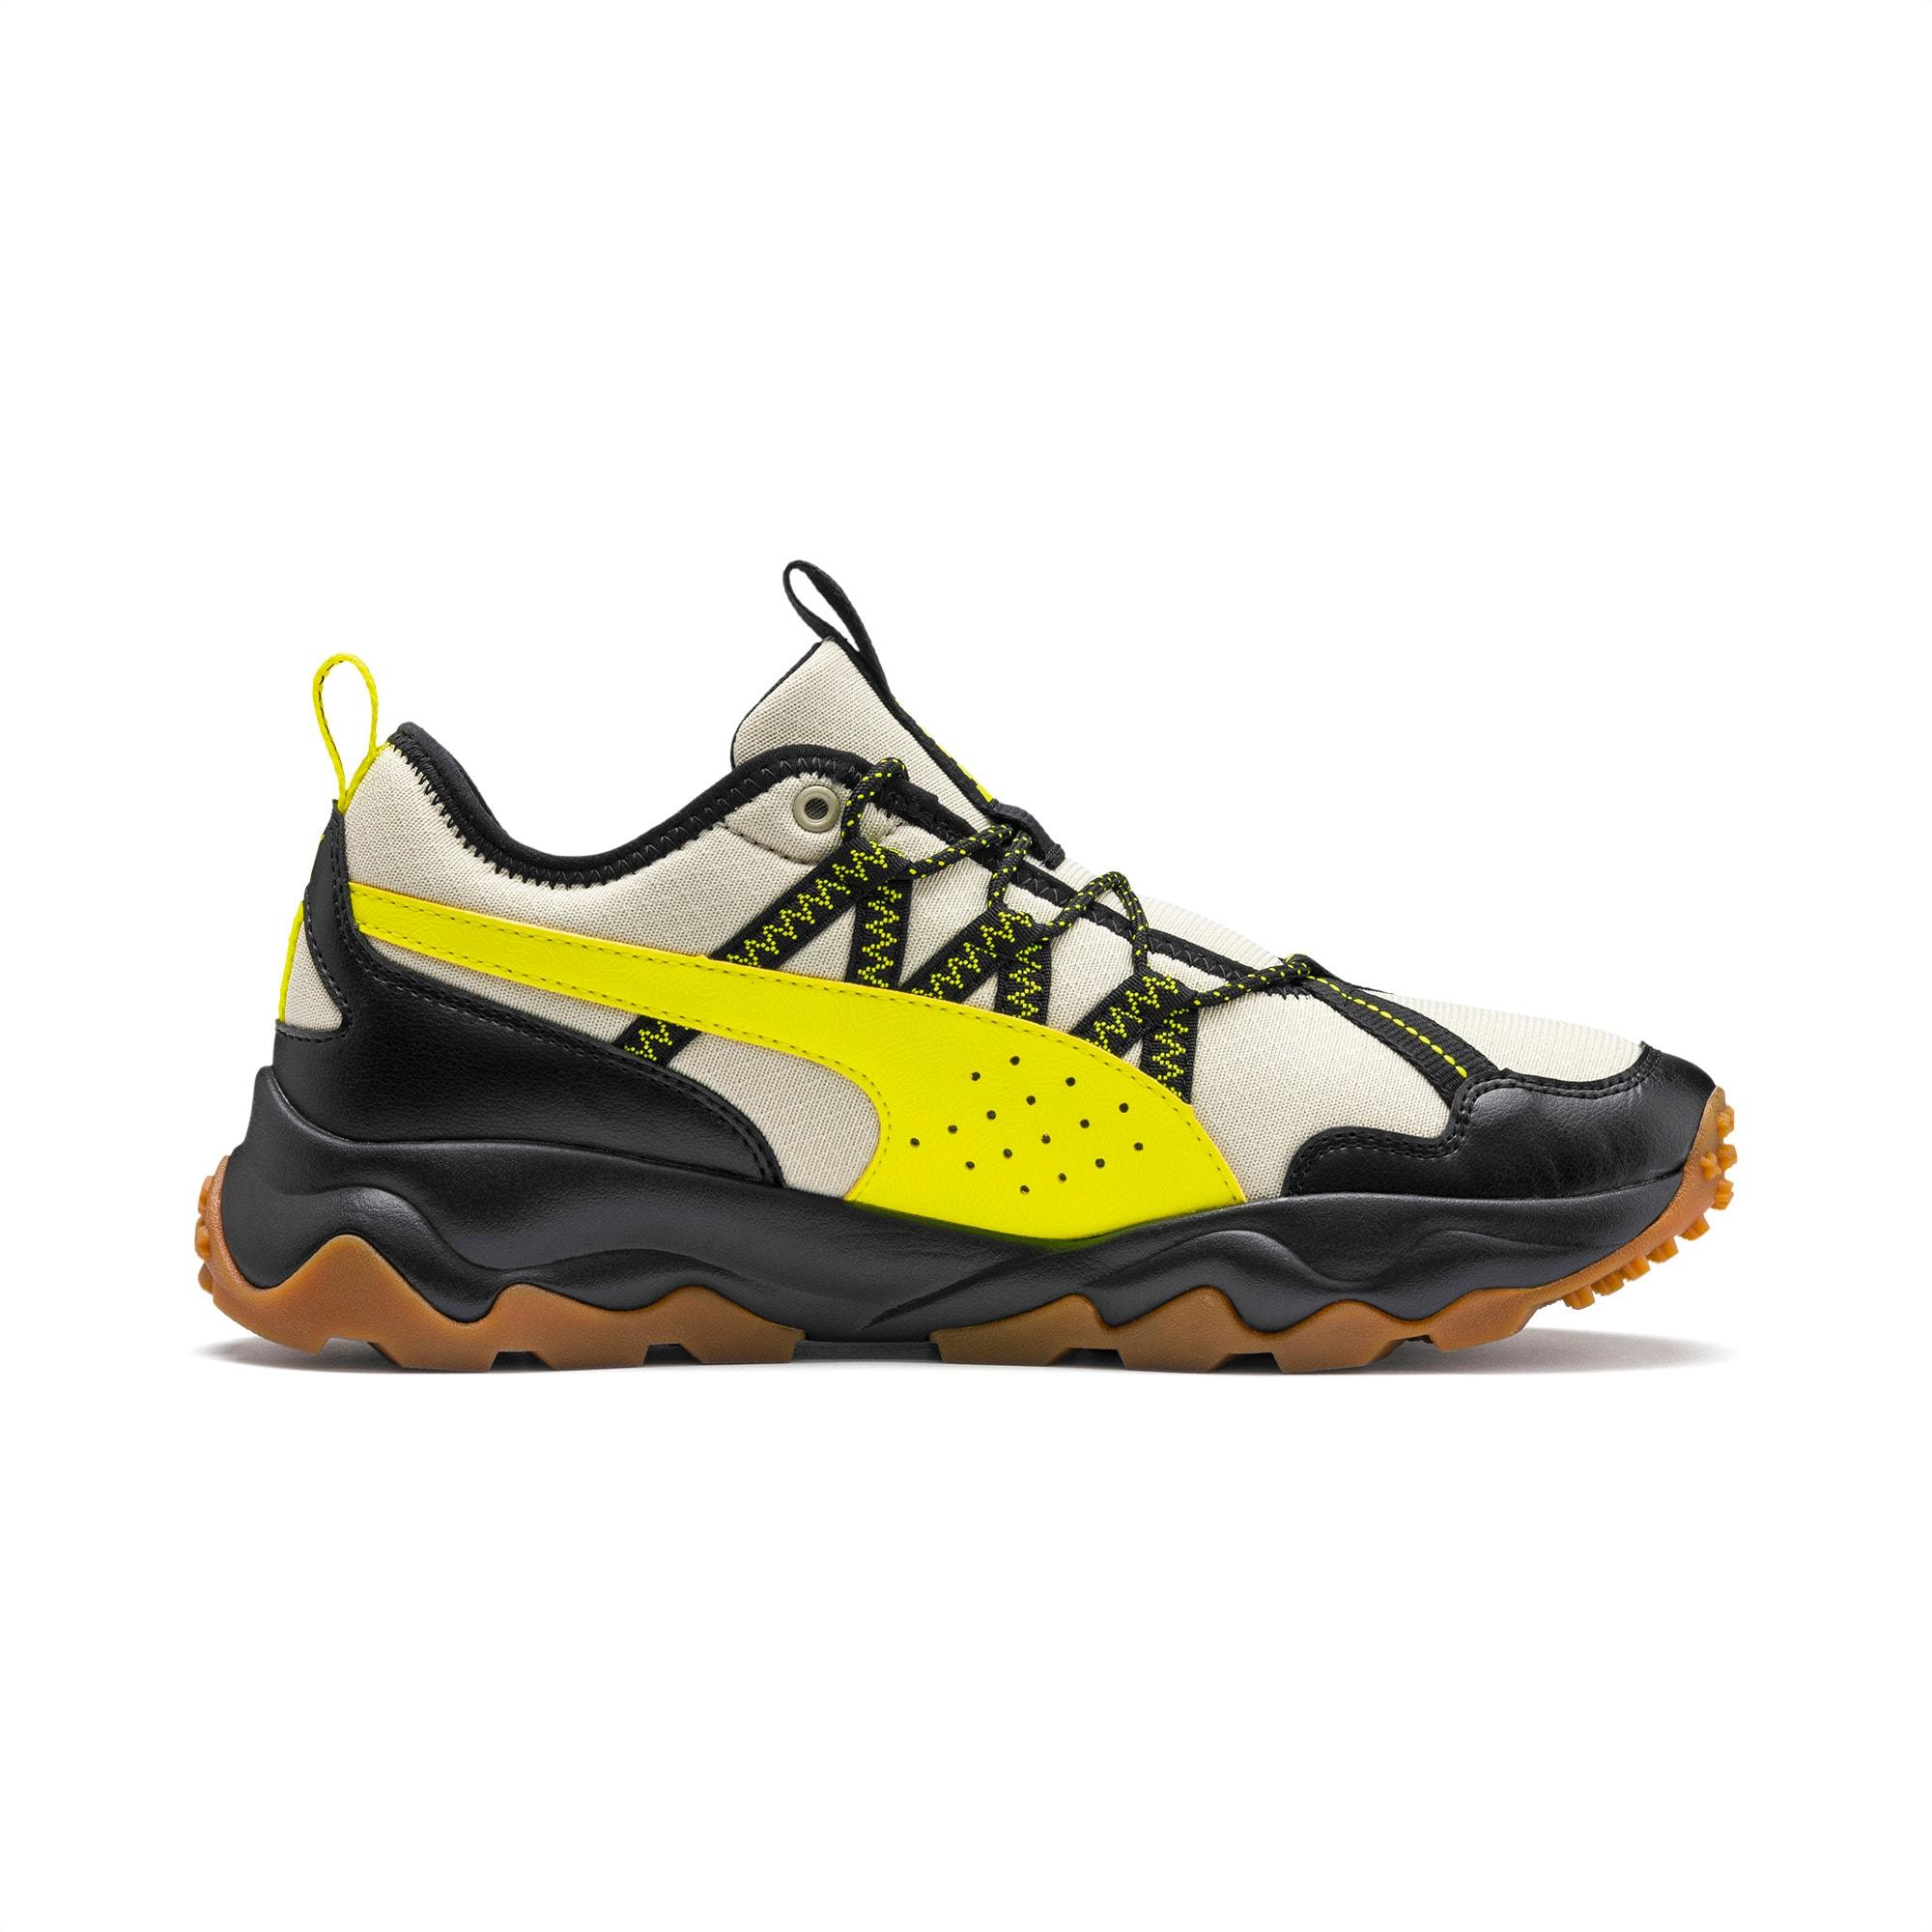 Men's Puma Sports Shoes Buy Puma Sports Shoes for Men